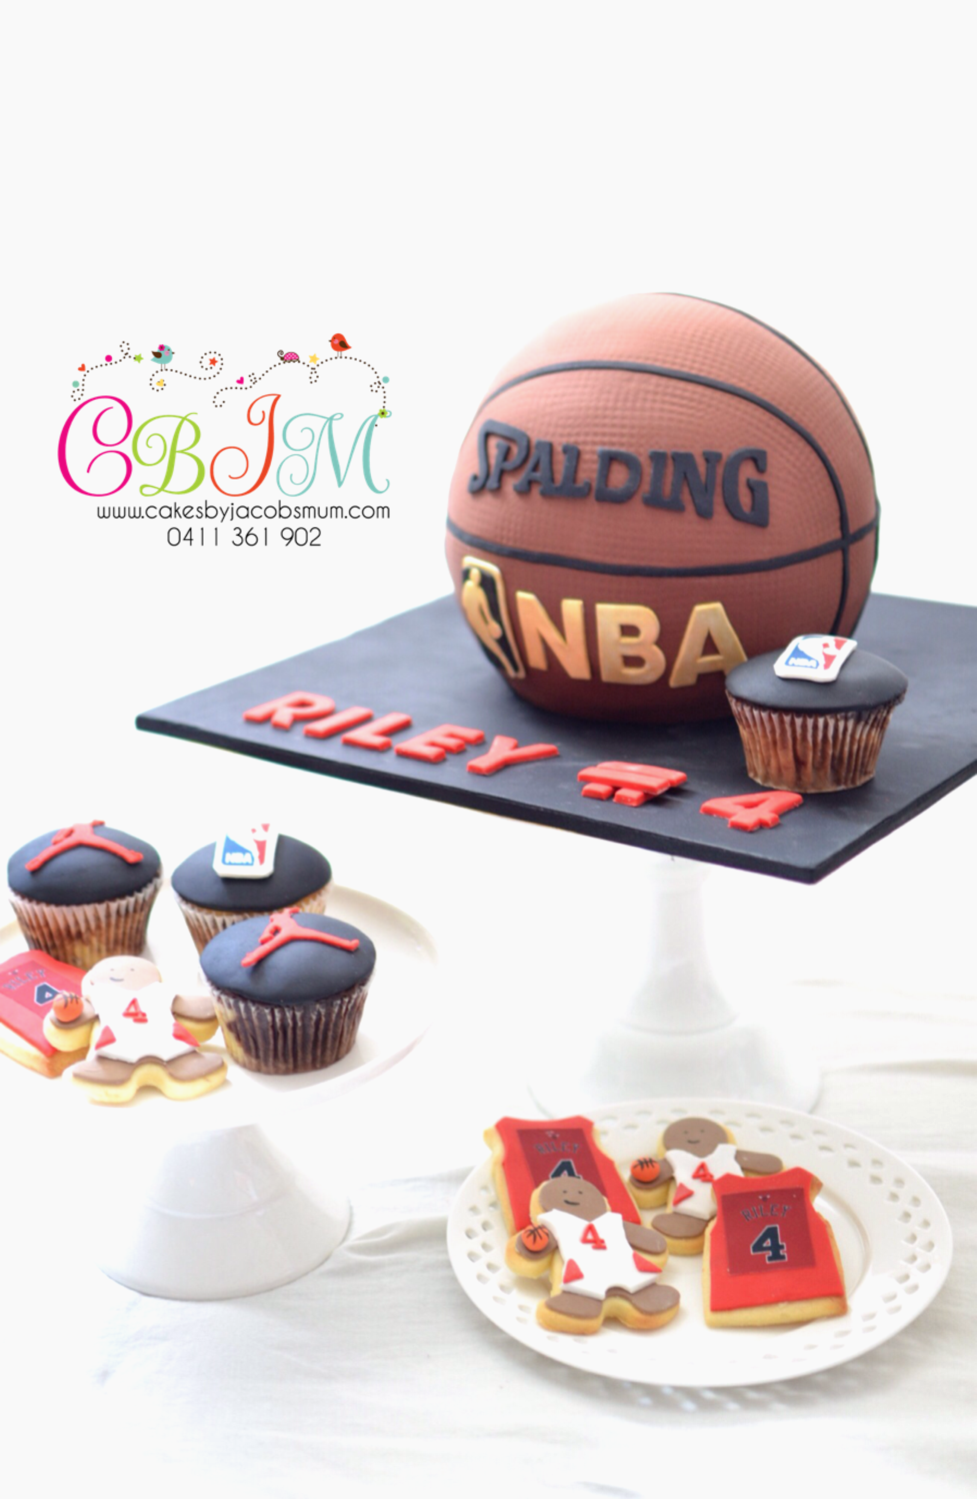 3D Basketball Cake, cupcakes,cookies